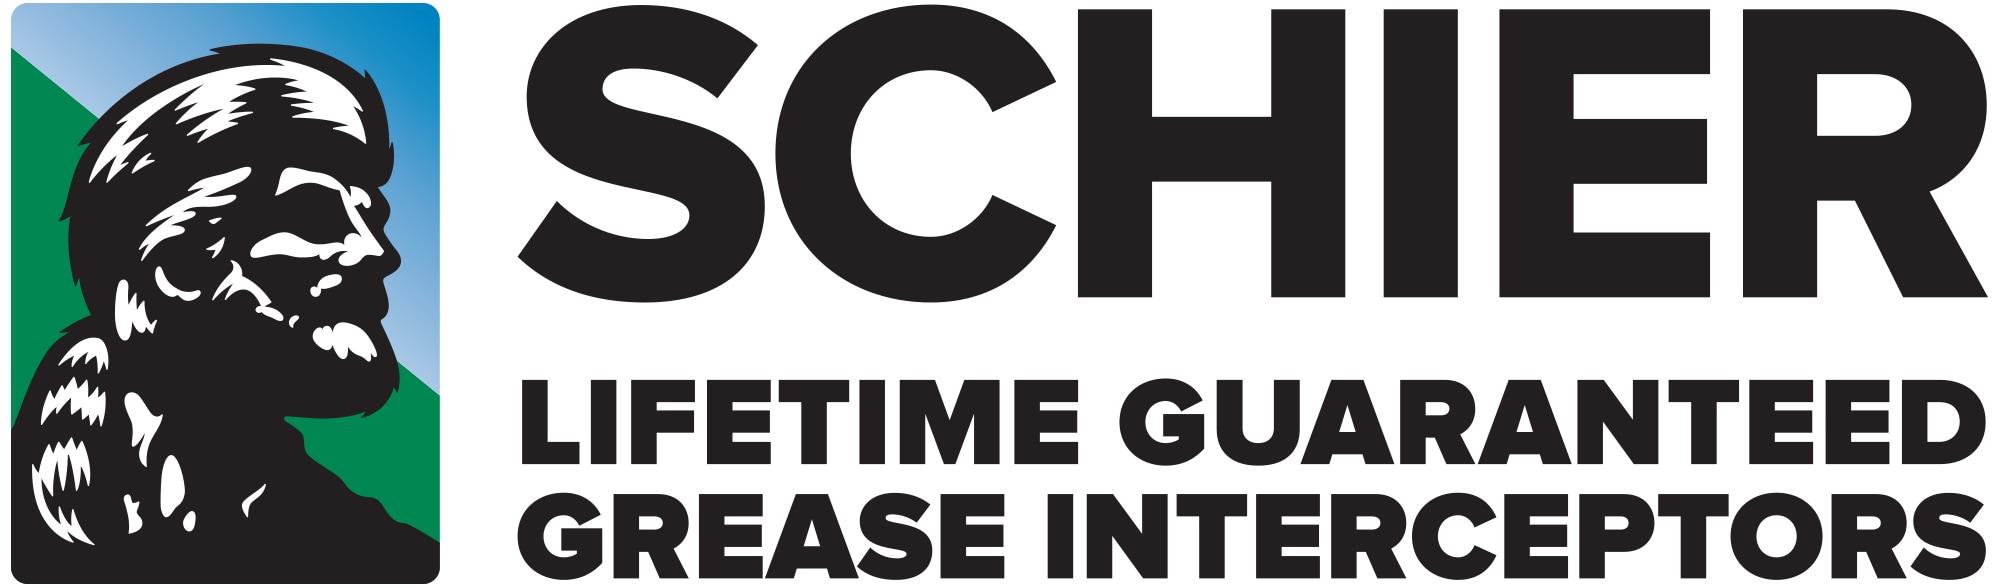 schier-logo-hzc_orig